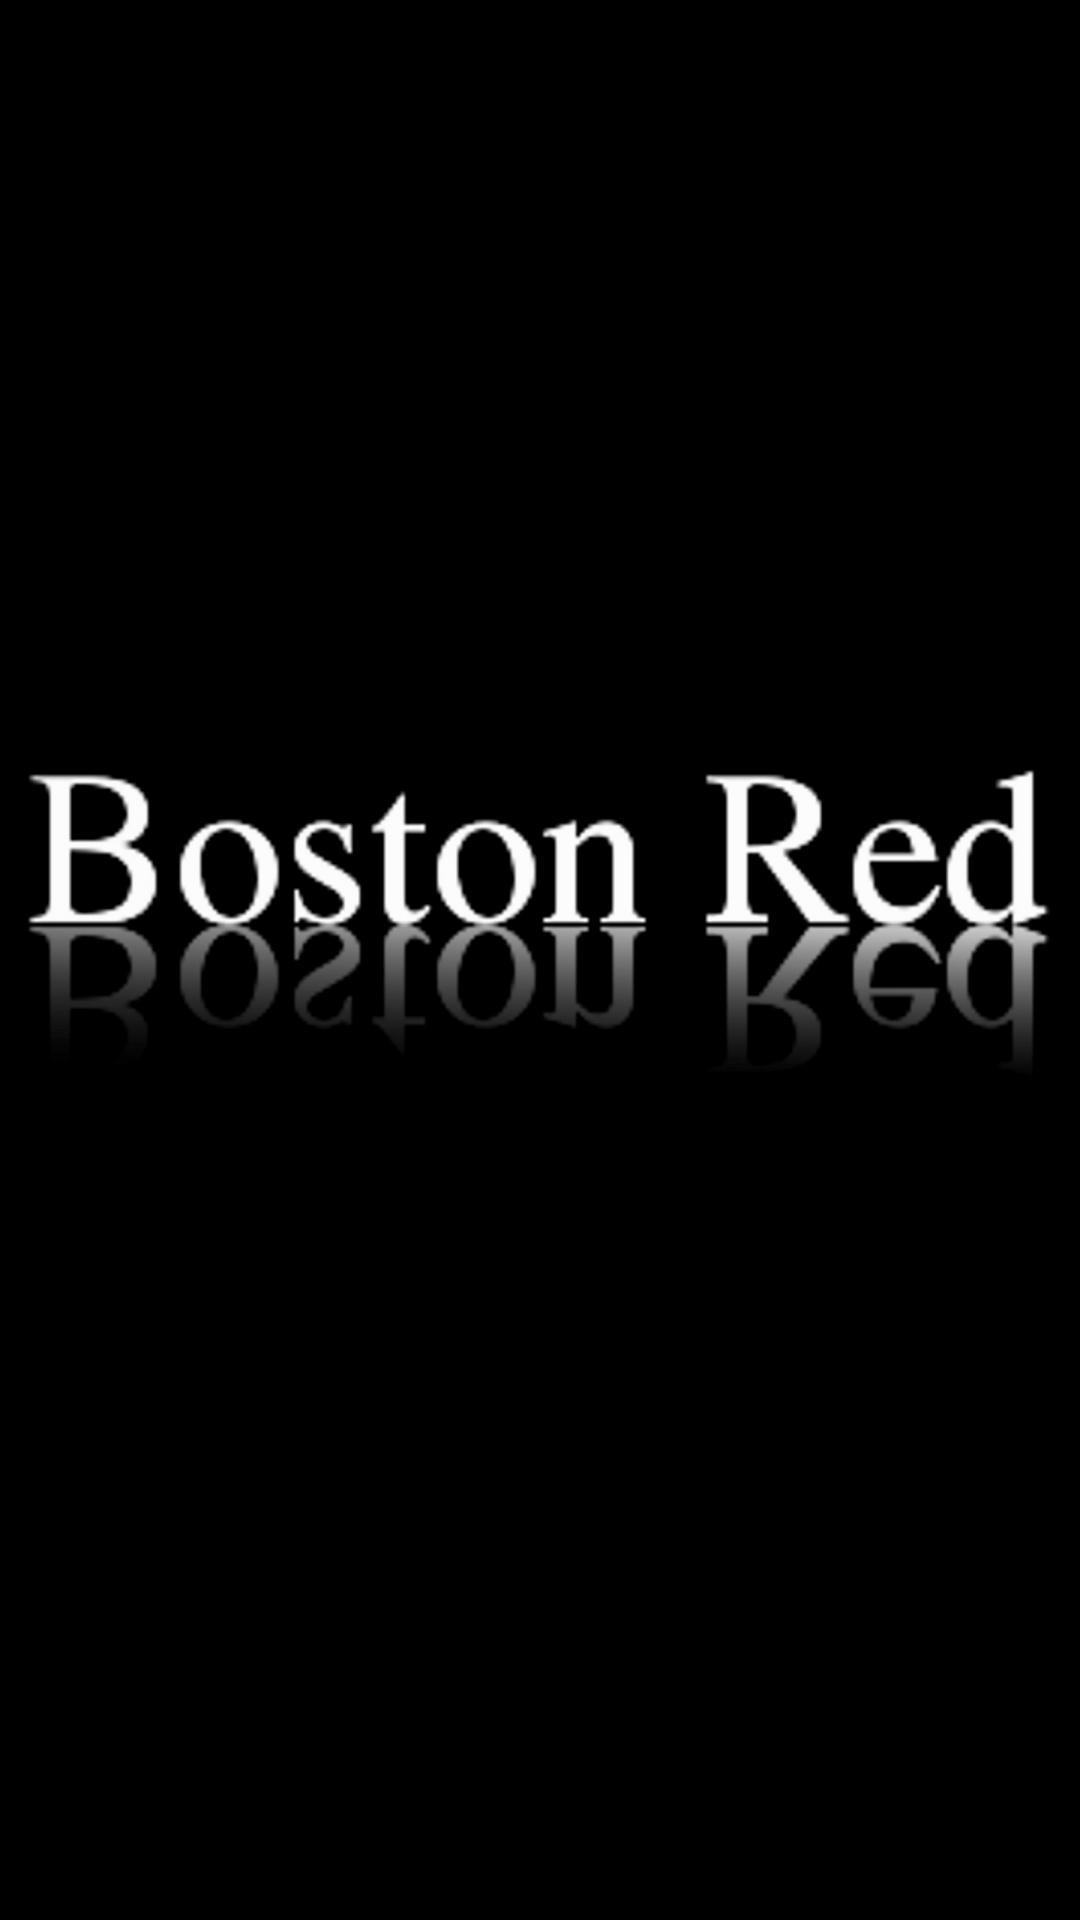 wallpaper.wiki-Boston-Red-Sox-iPhone-Wallpaper-Free-